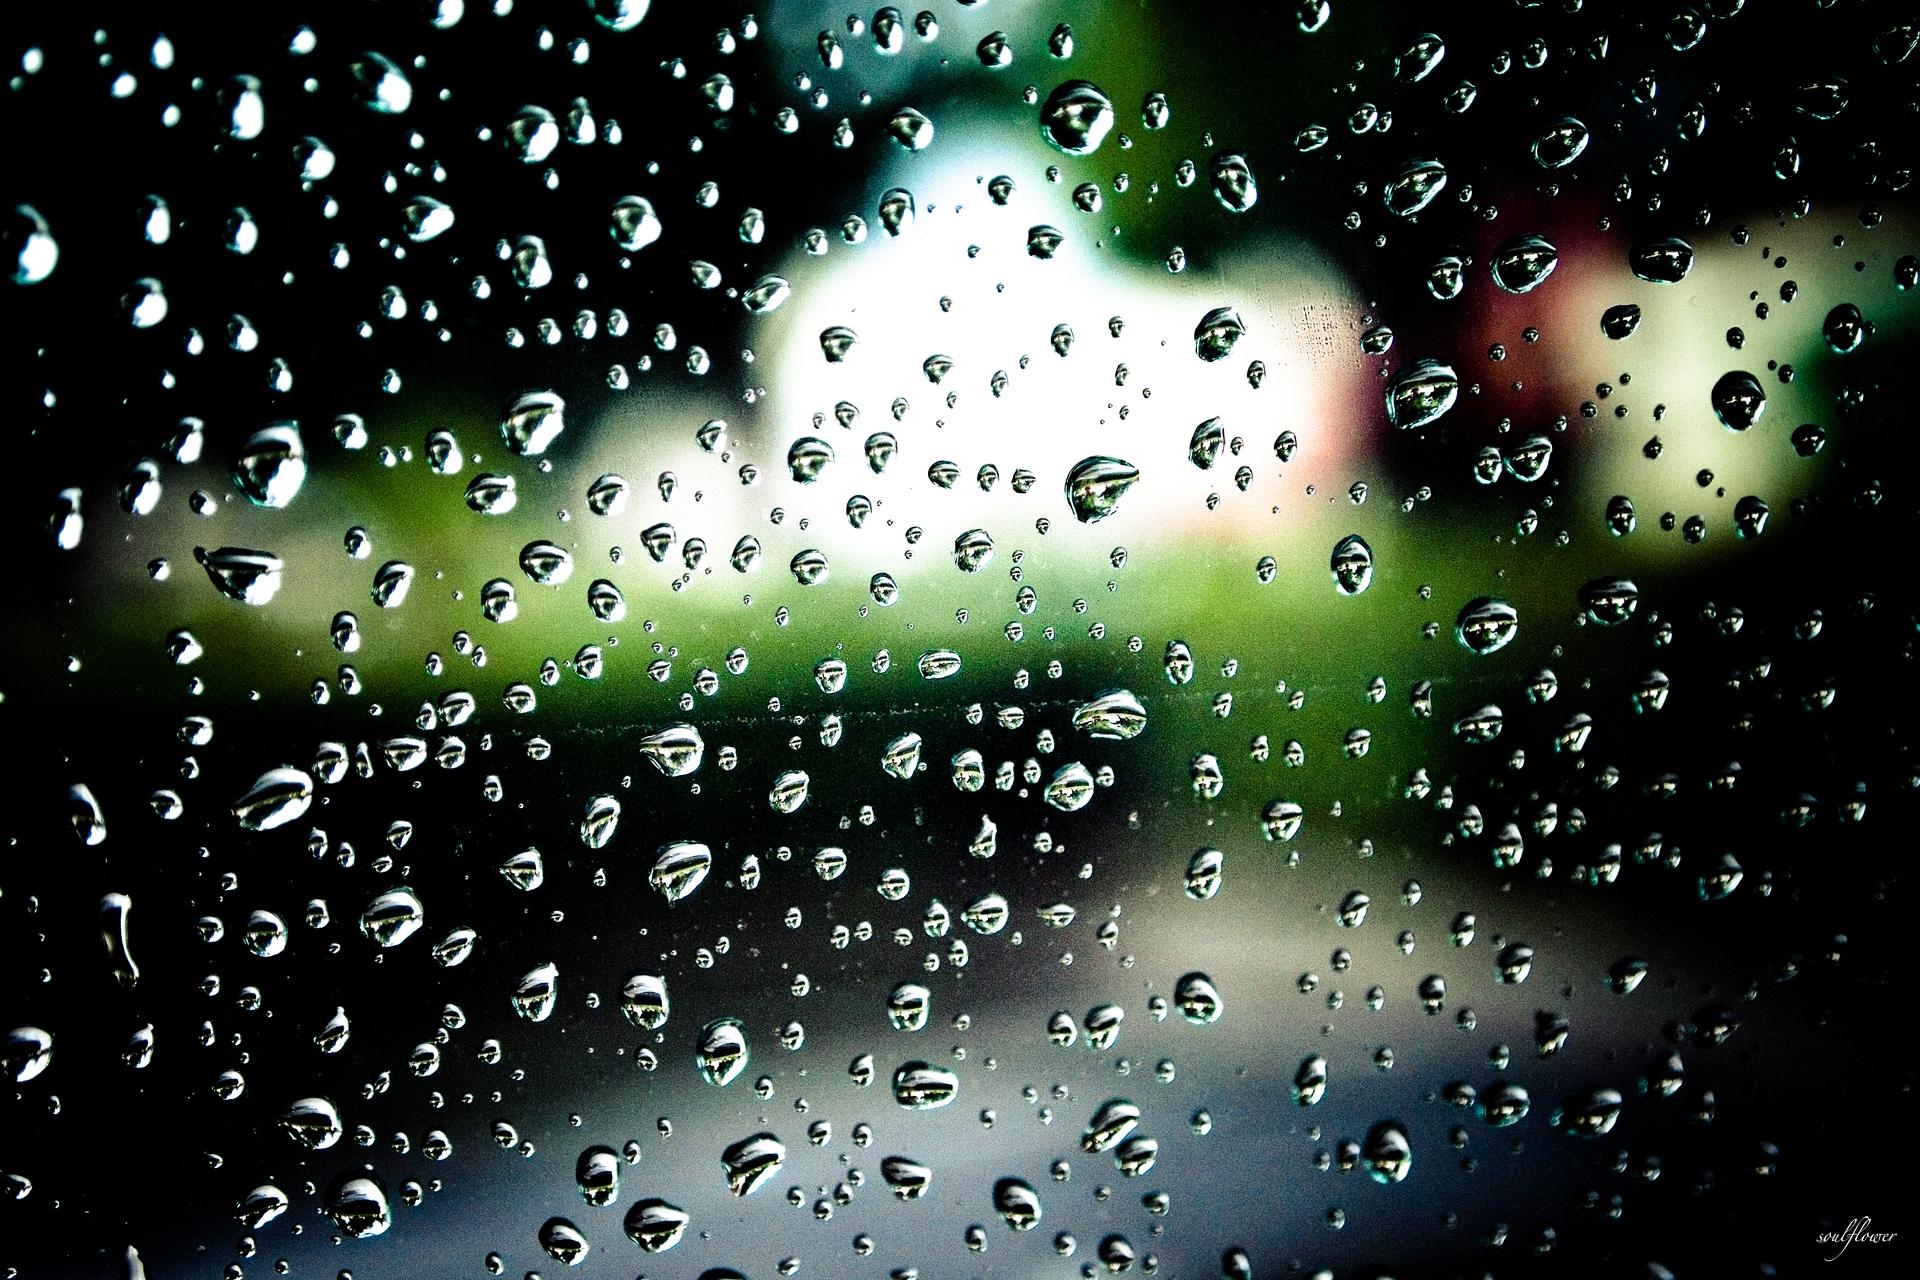 47 raindrops wallpaper for windows 7 on wallpapersafari - Rainy window wallpaper ...